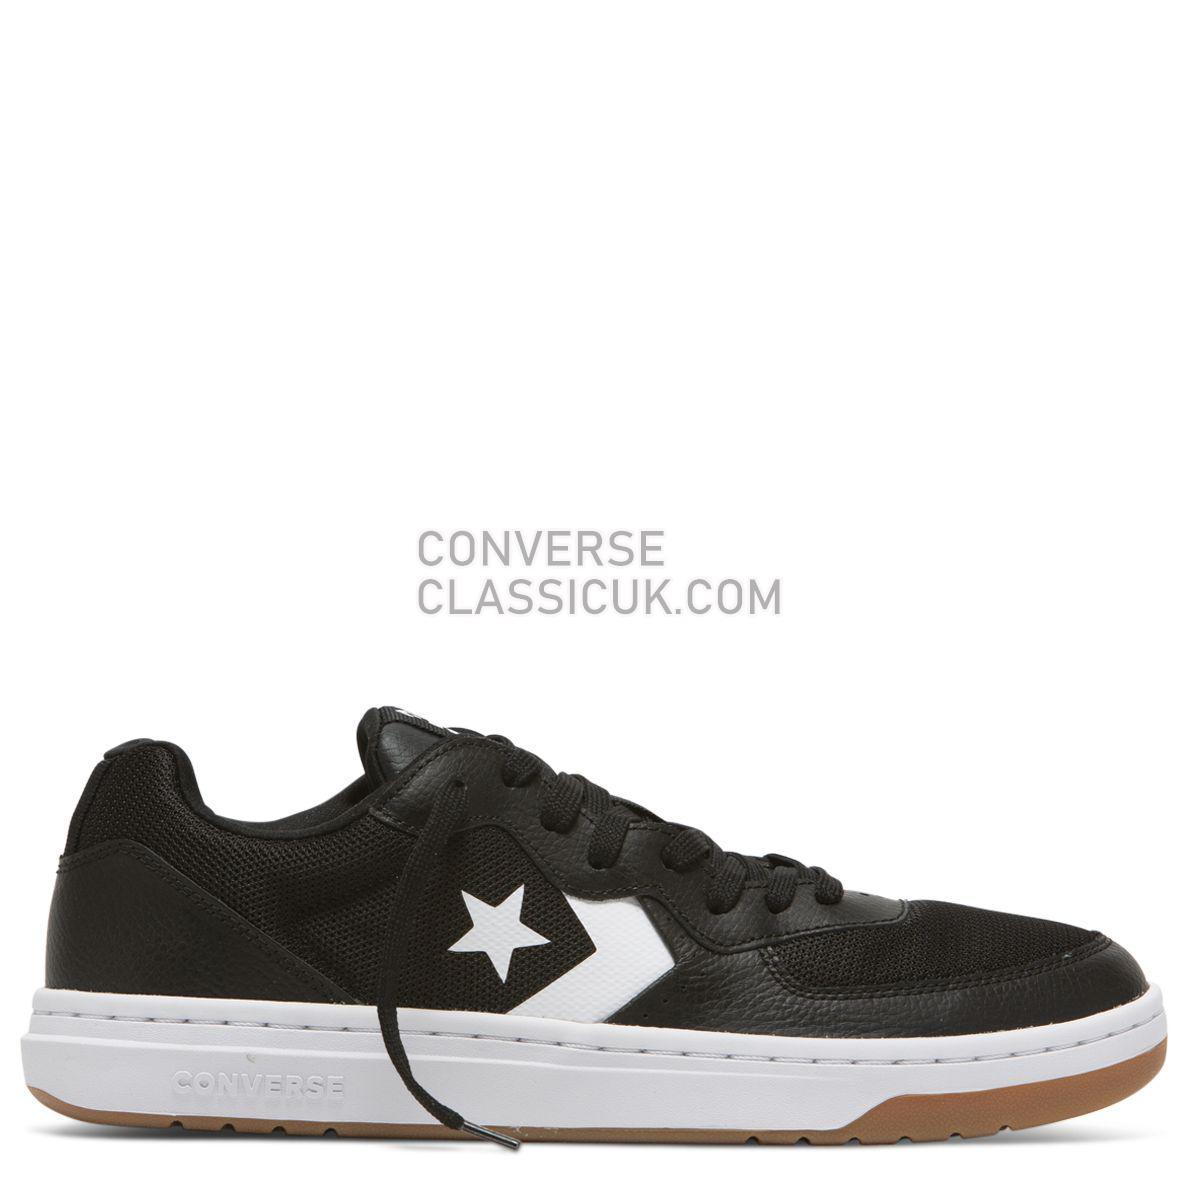 Converse Rival Leather Low Top Black/White Mens 163207 Black/White/Gum Shoes